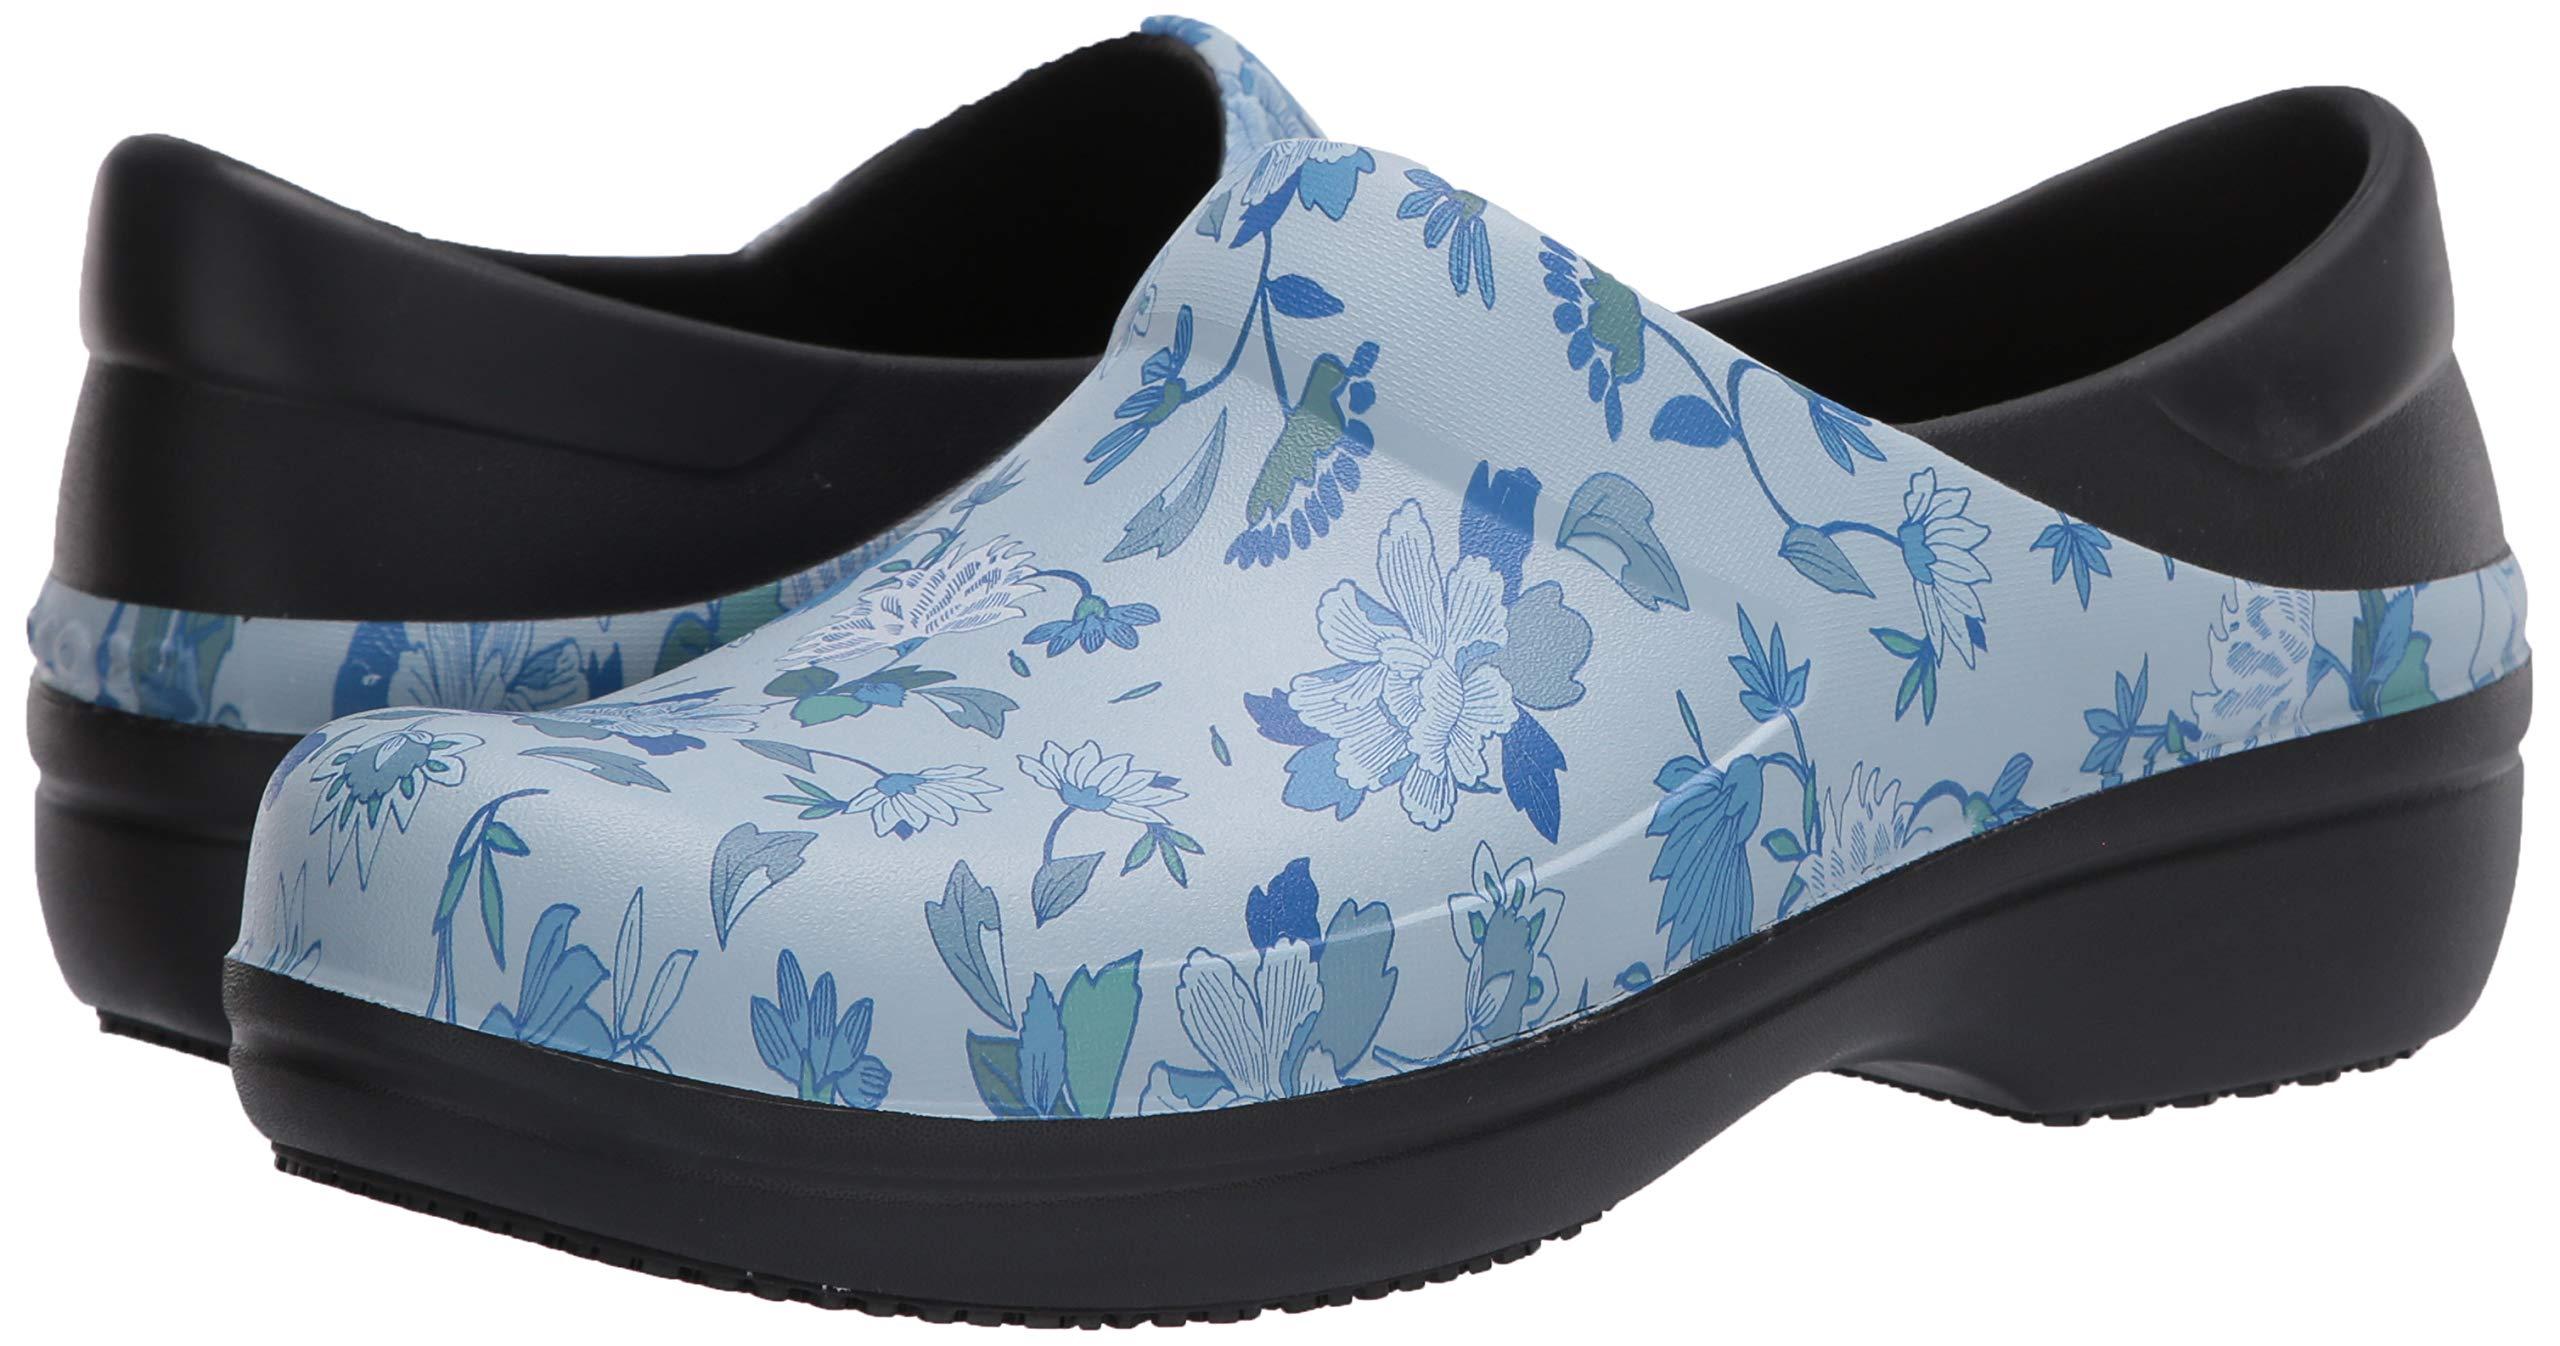 Crocs Women's Neria Pro Ii Clog  Slip-Resistant Work and Nursing Shoe